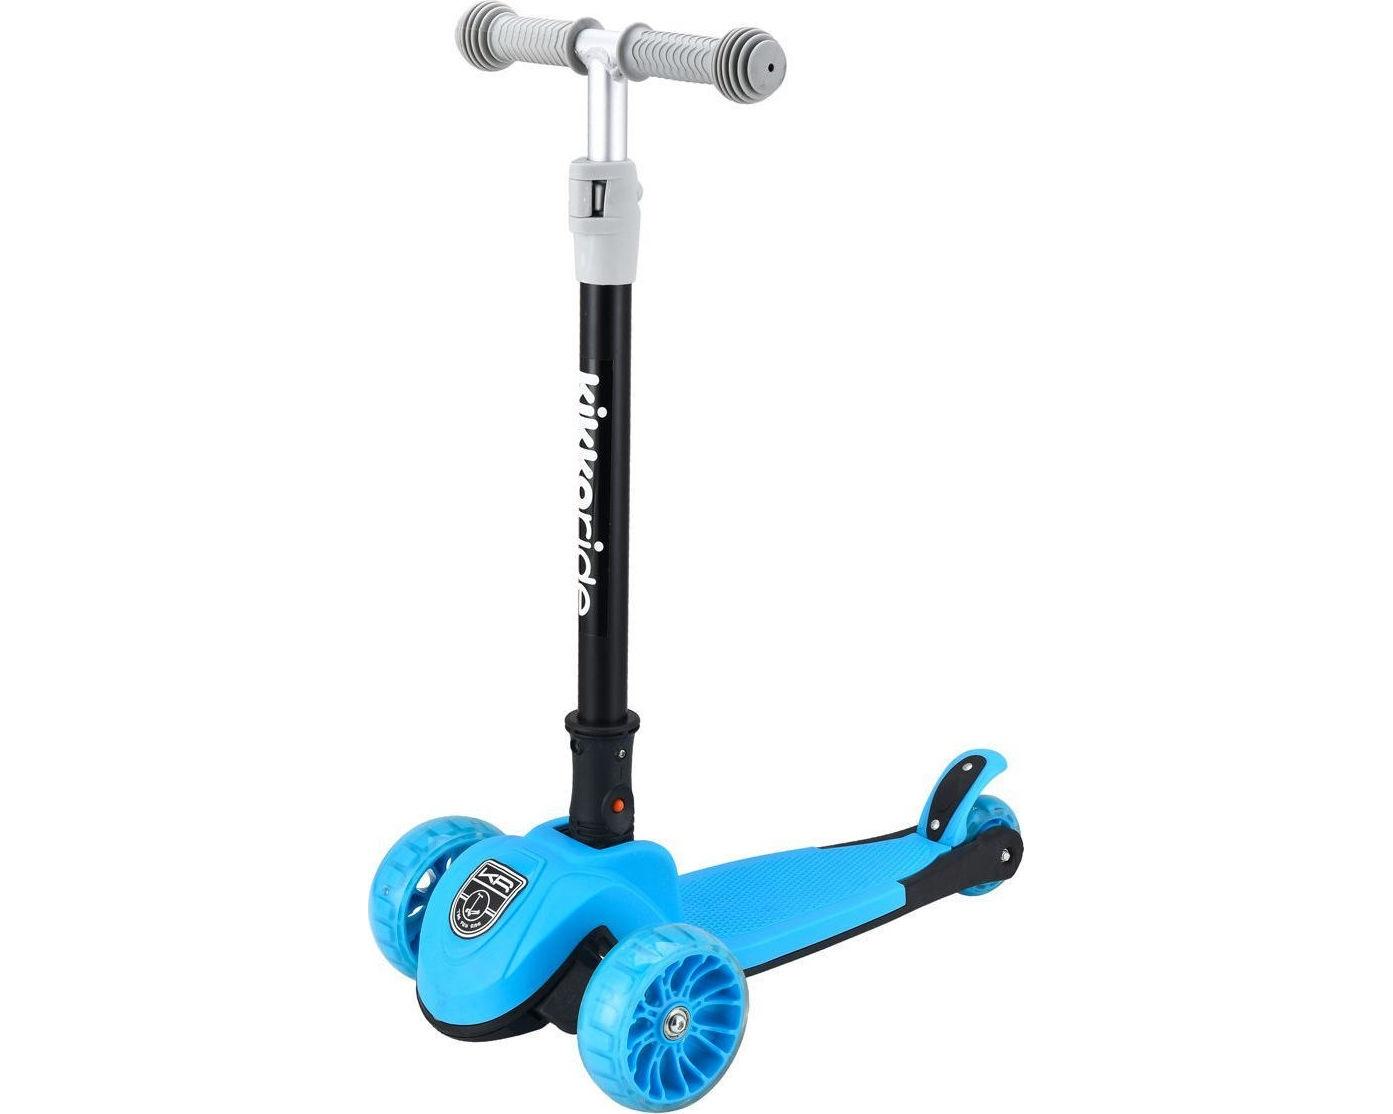 Kikkaboo Πατίνι Scooter Τρίτροχο Jett Blue 3ετών+